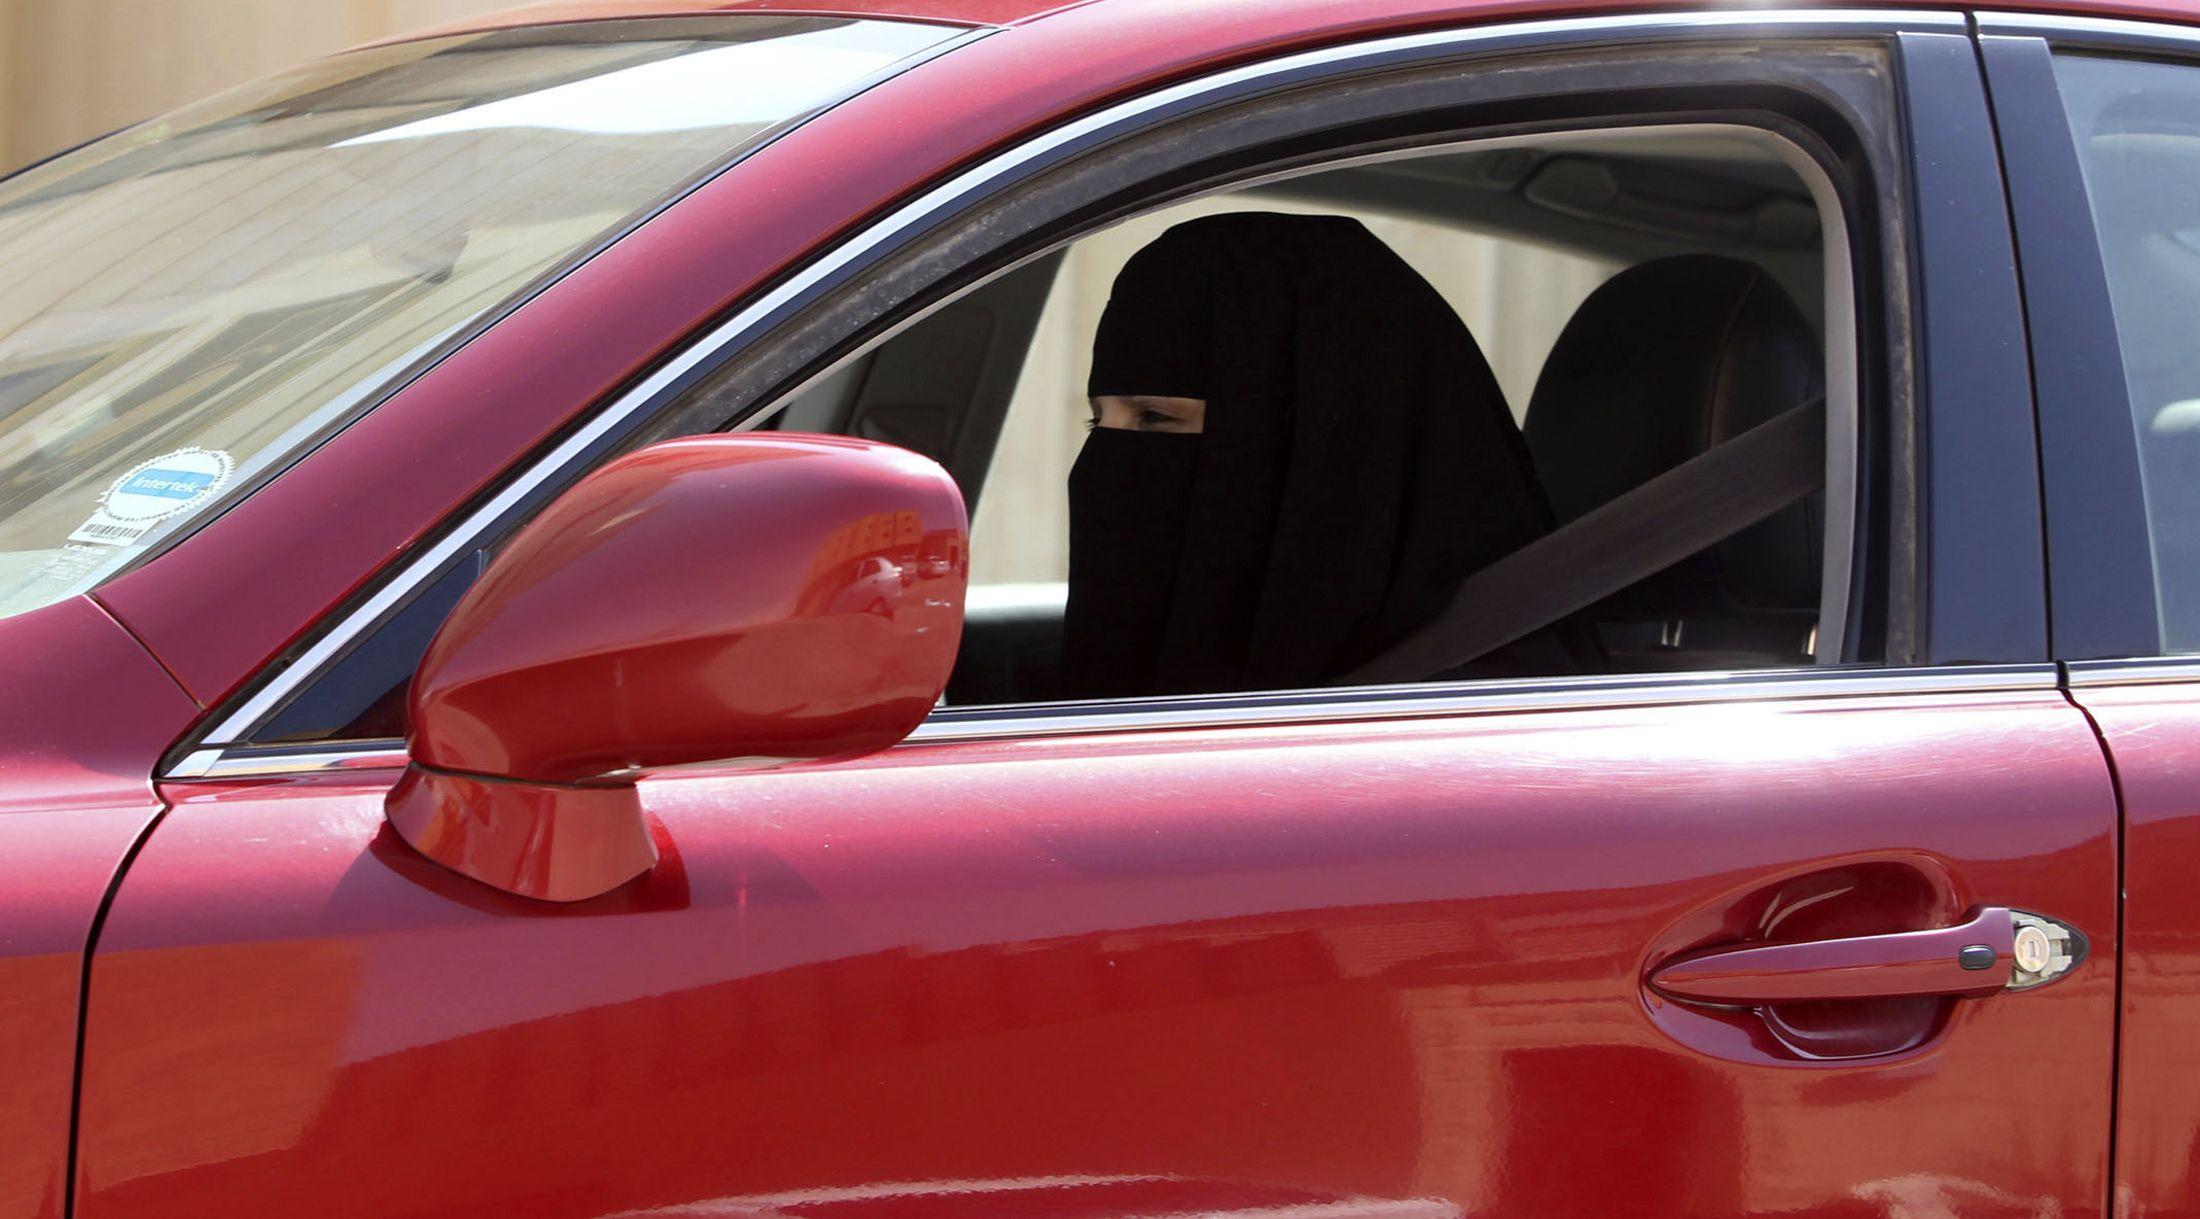 12-29-14 Woman driving Saudi Arabia